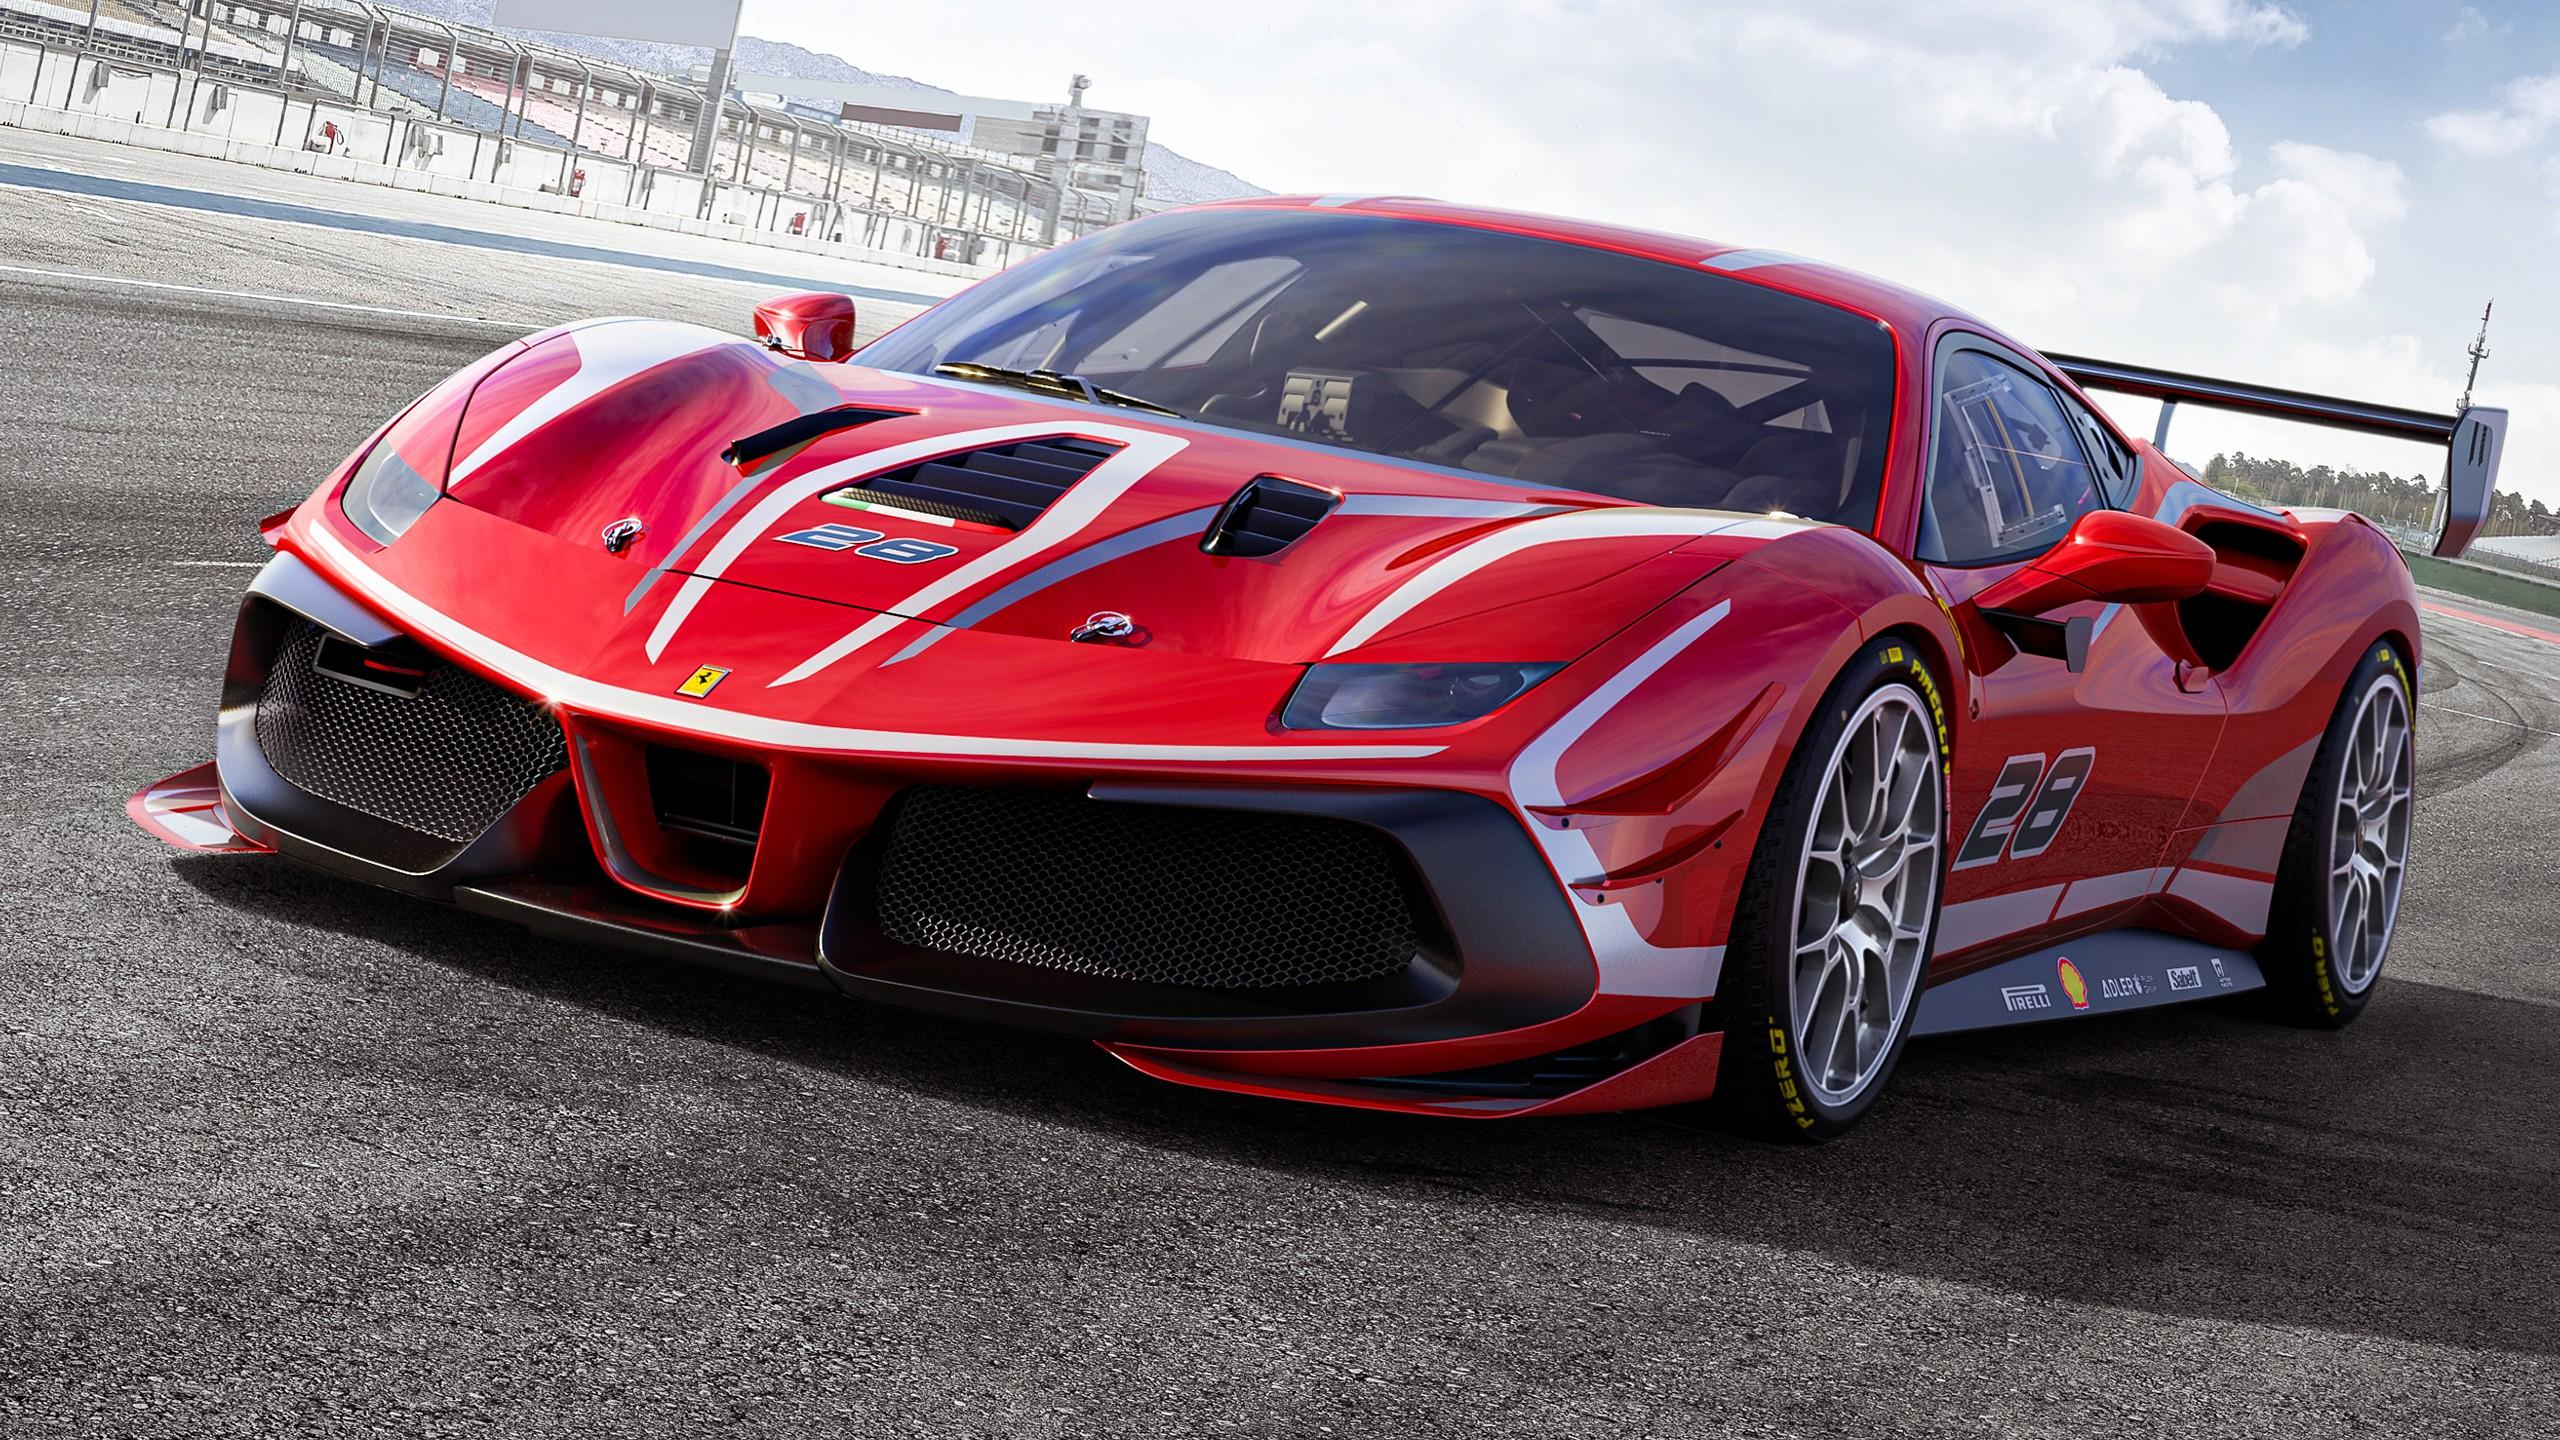 36] Ferrari 488 Challenge Evo 2020 Wallpapers on WallpaperSafari 2560x1440